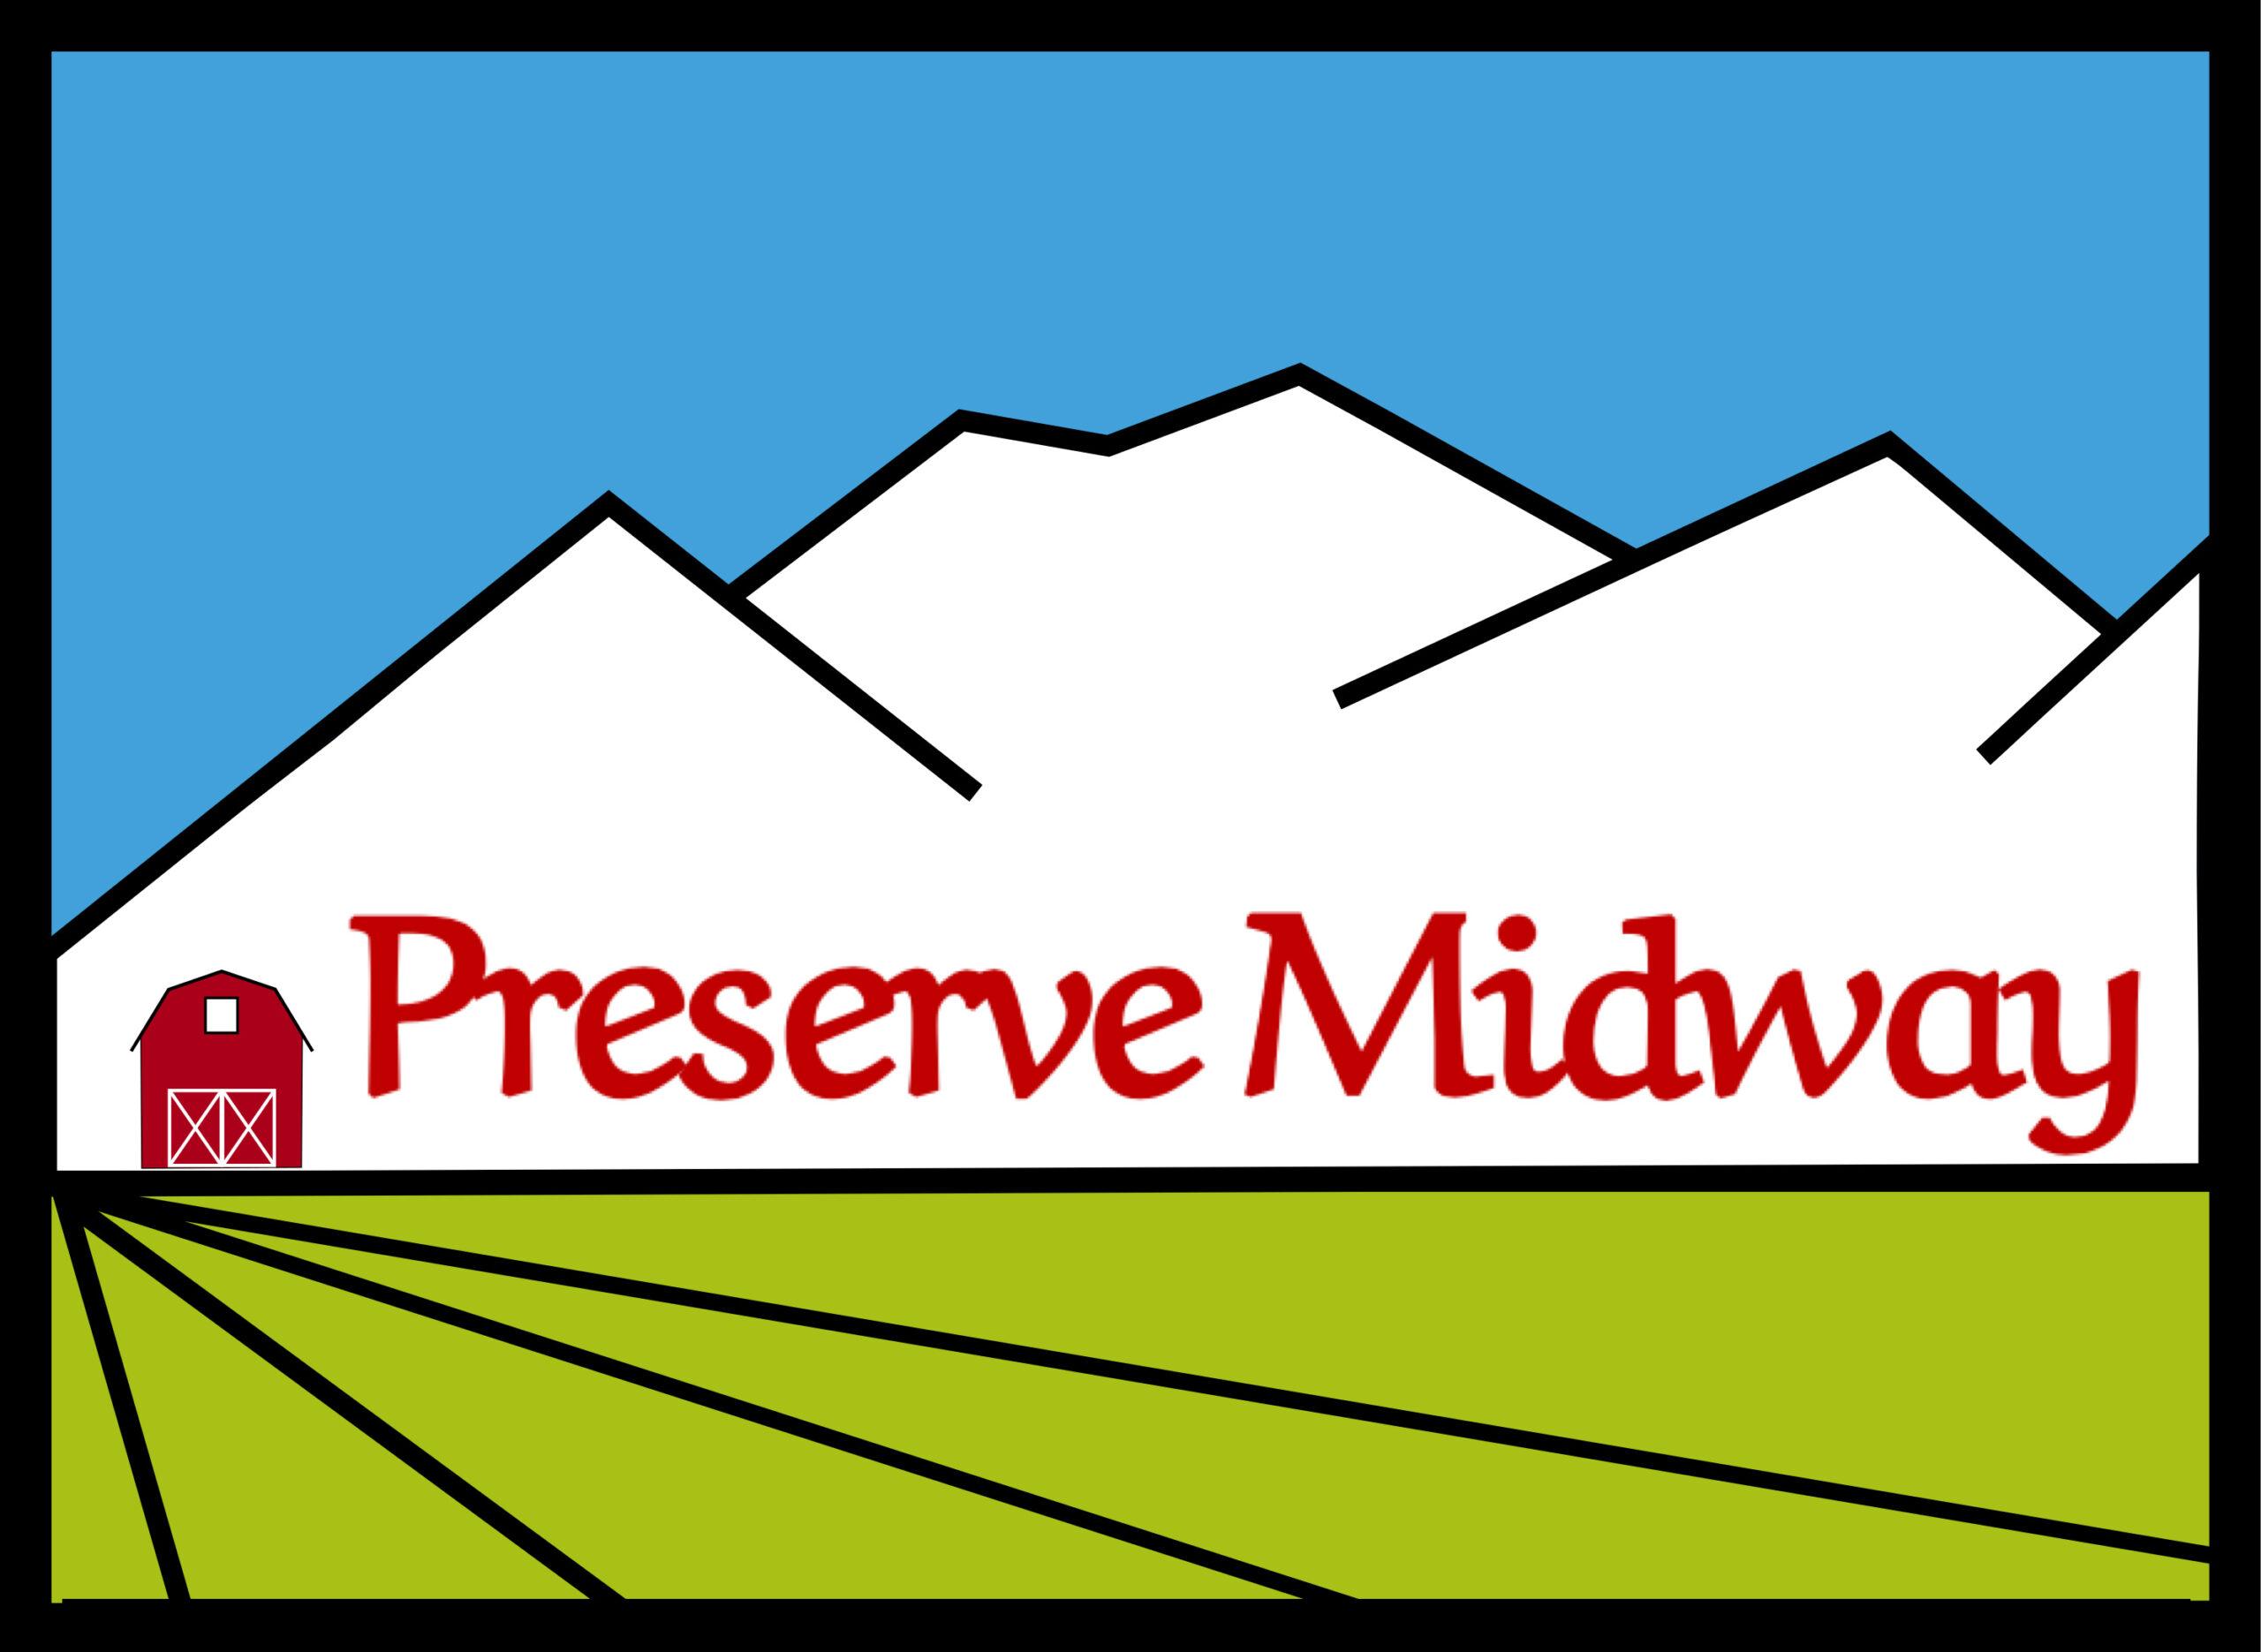 Preserve Midway